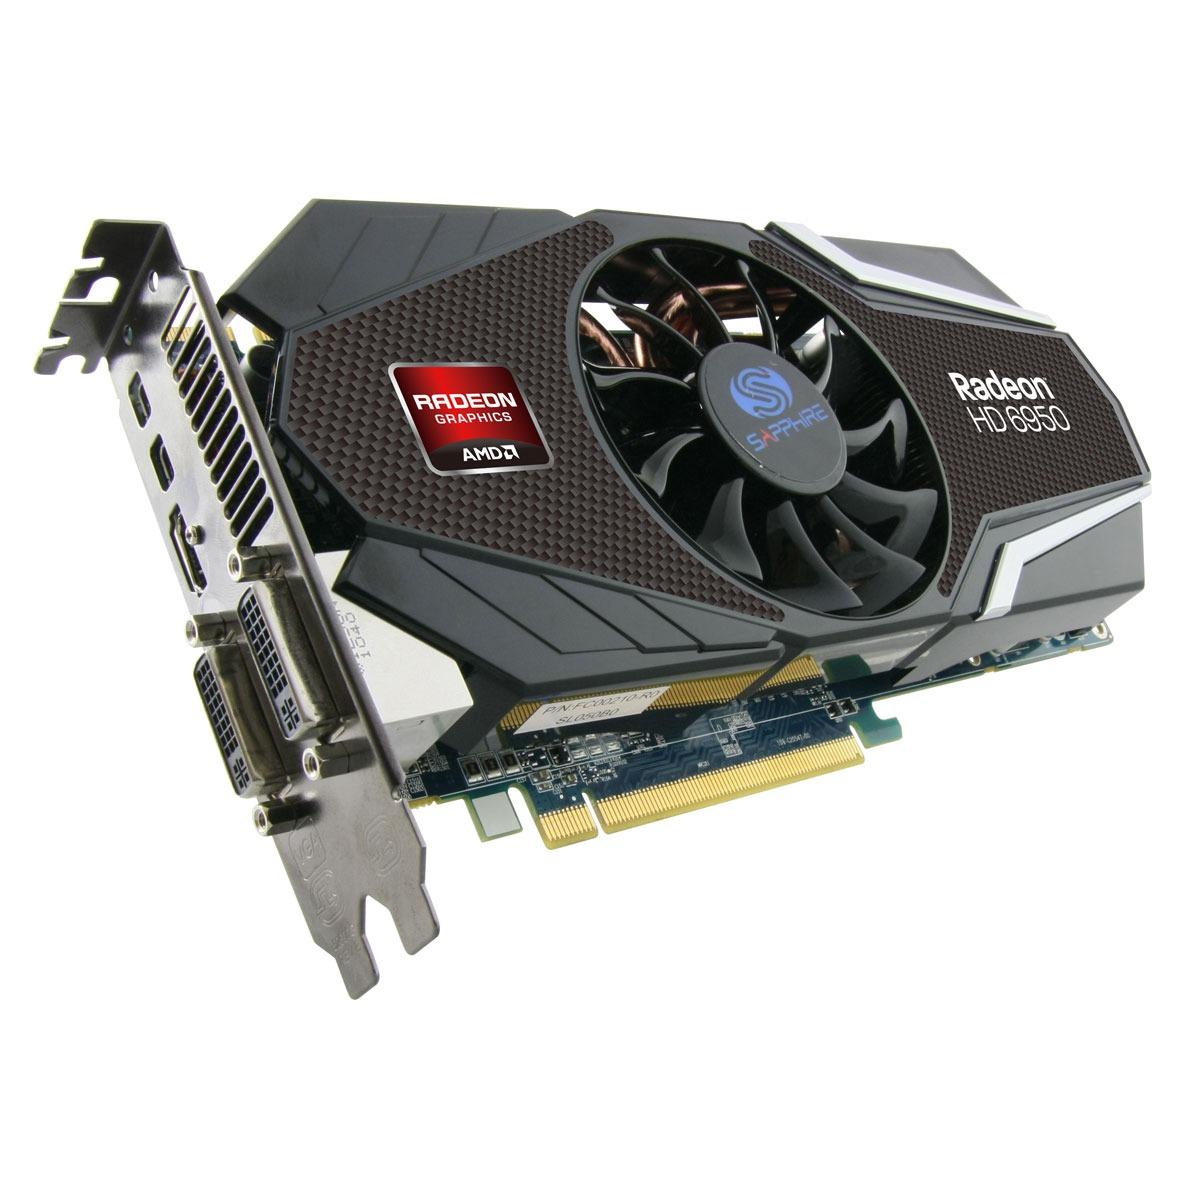 Sapphire Radeon HD 6950 2 GB Dual Mini DisplayPort (11188-00-40R) : achat / vente Carte ...